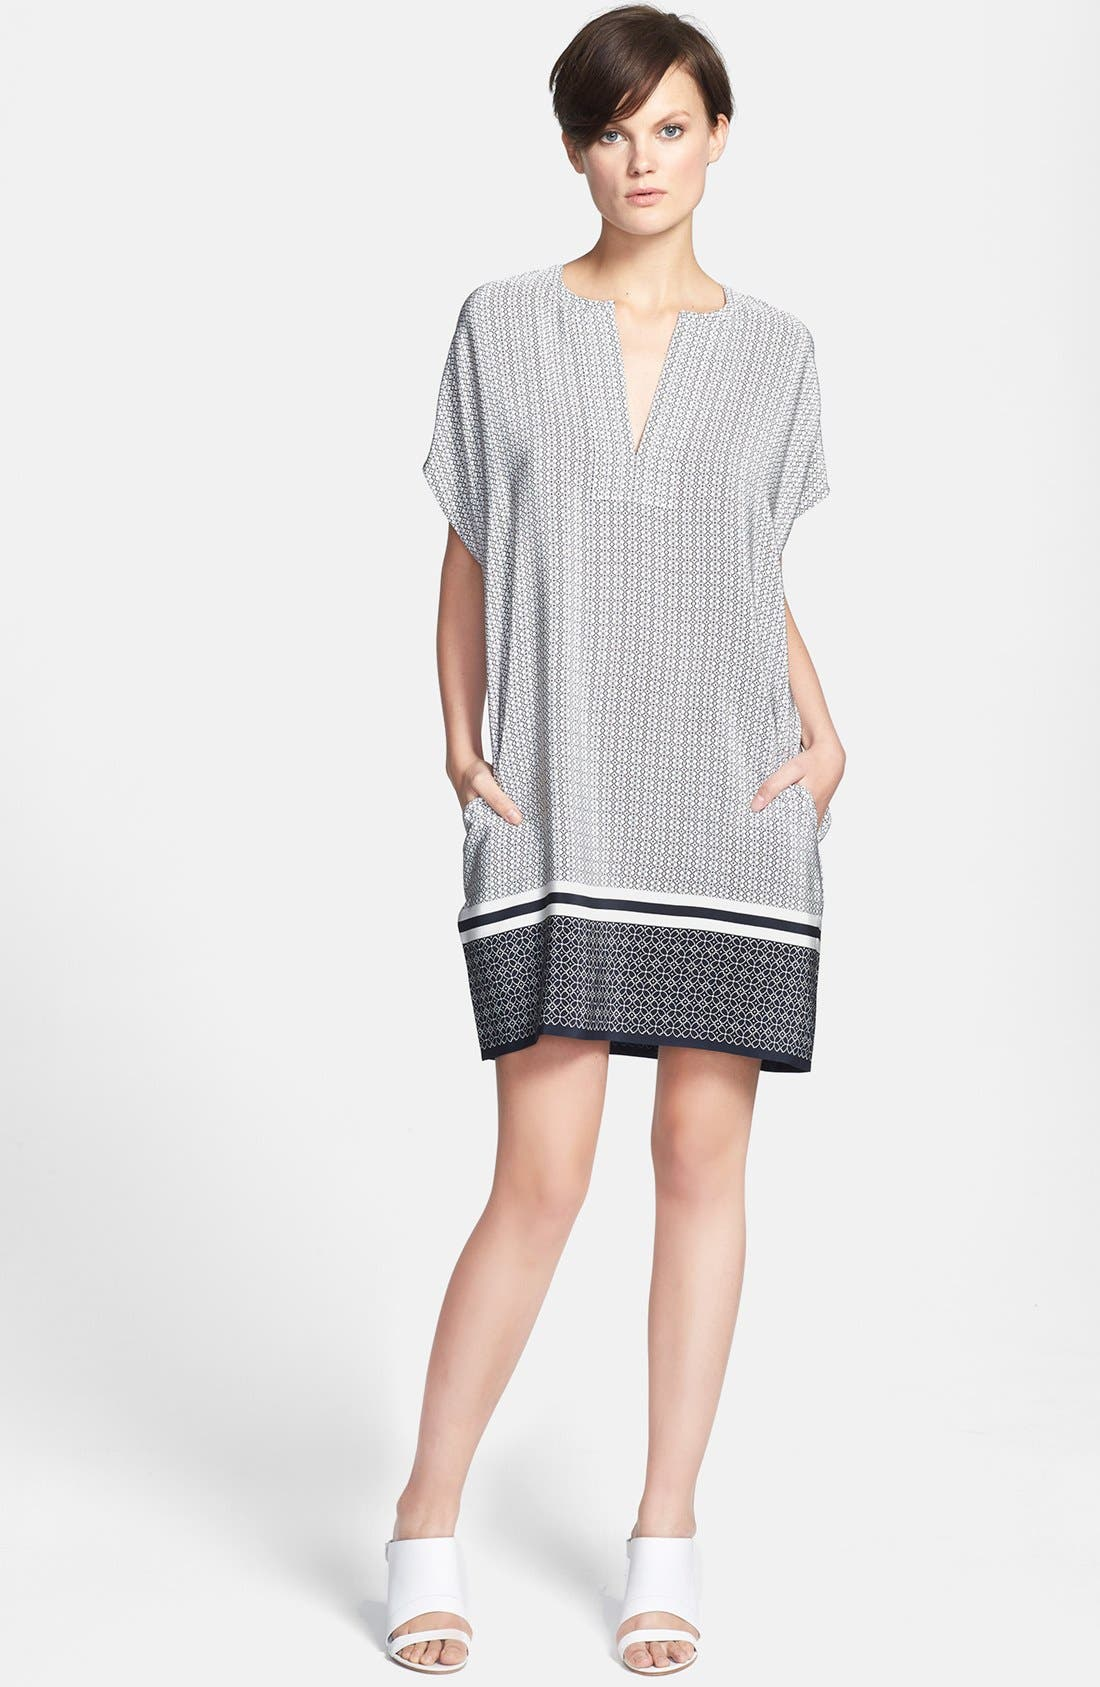 Alternate Image 1 Selected - Vince 'Trapunto' Print Dress